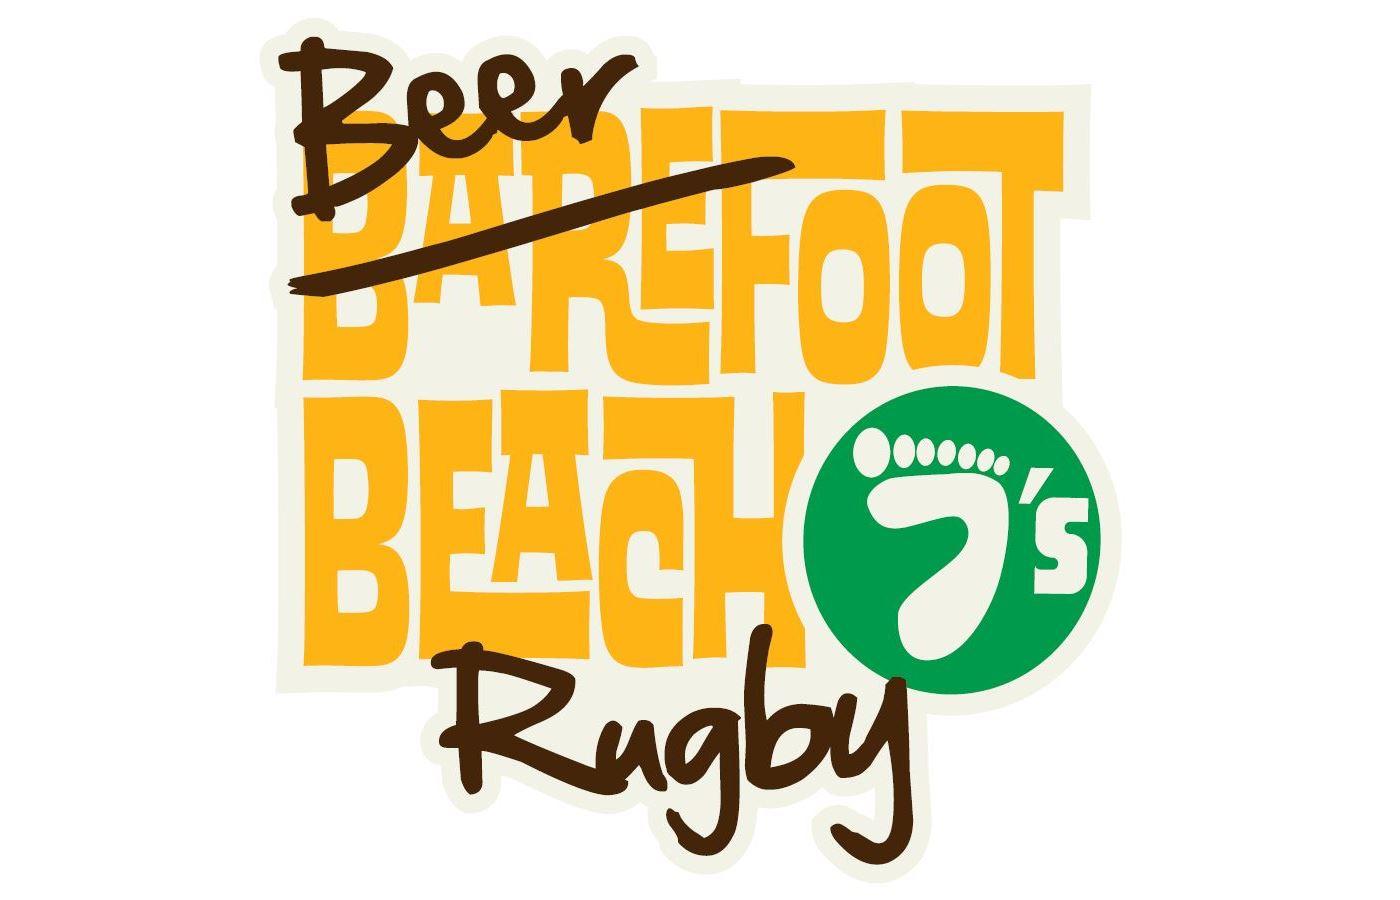 beerfoot-beach-sevens-rugby-logo